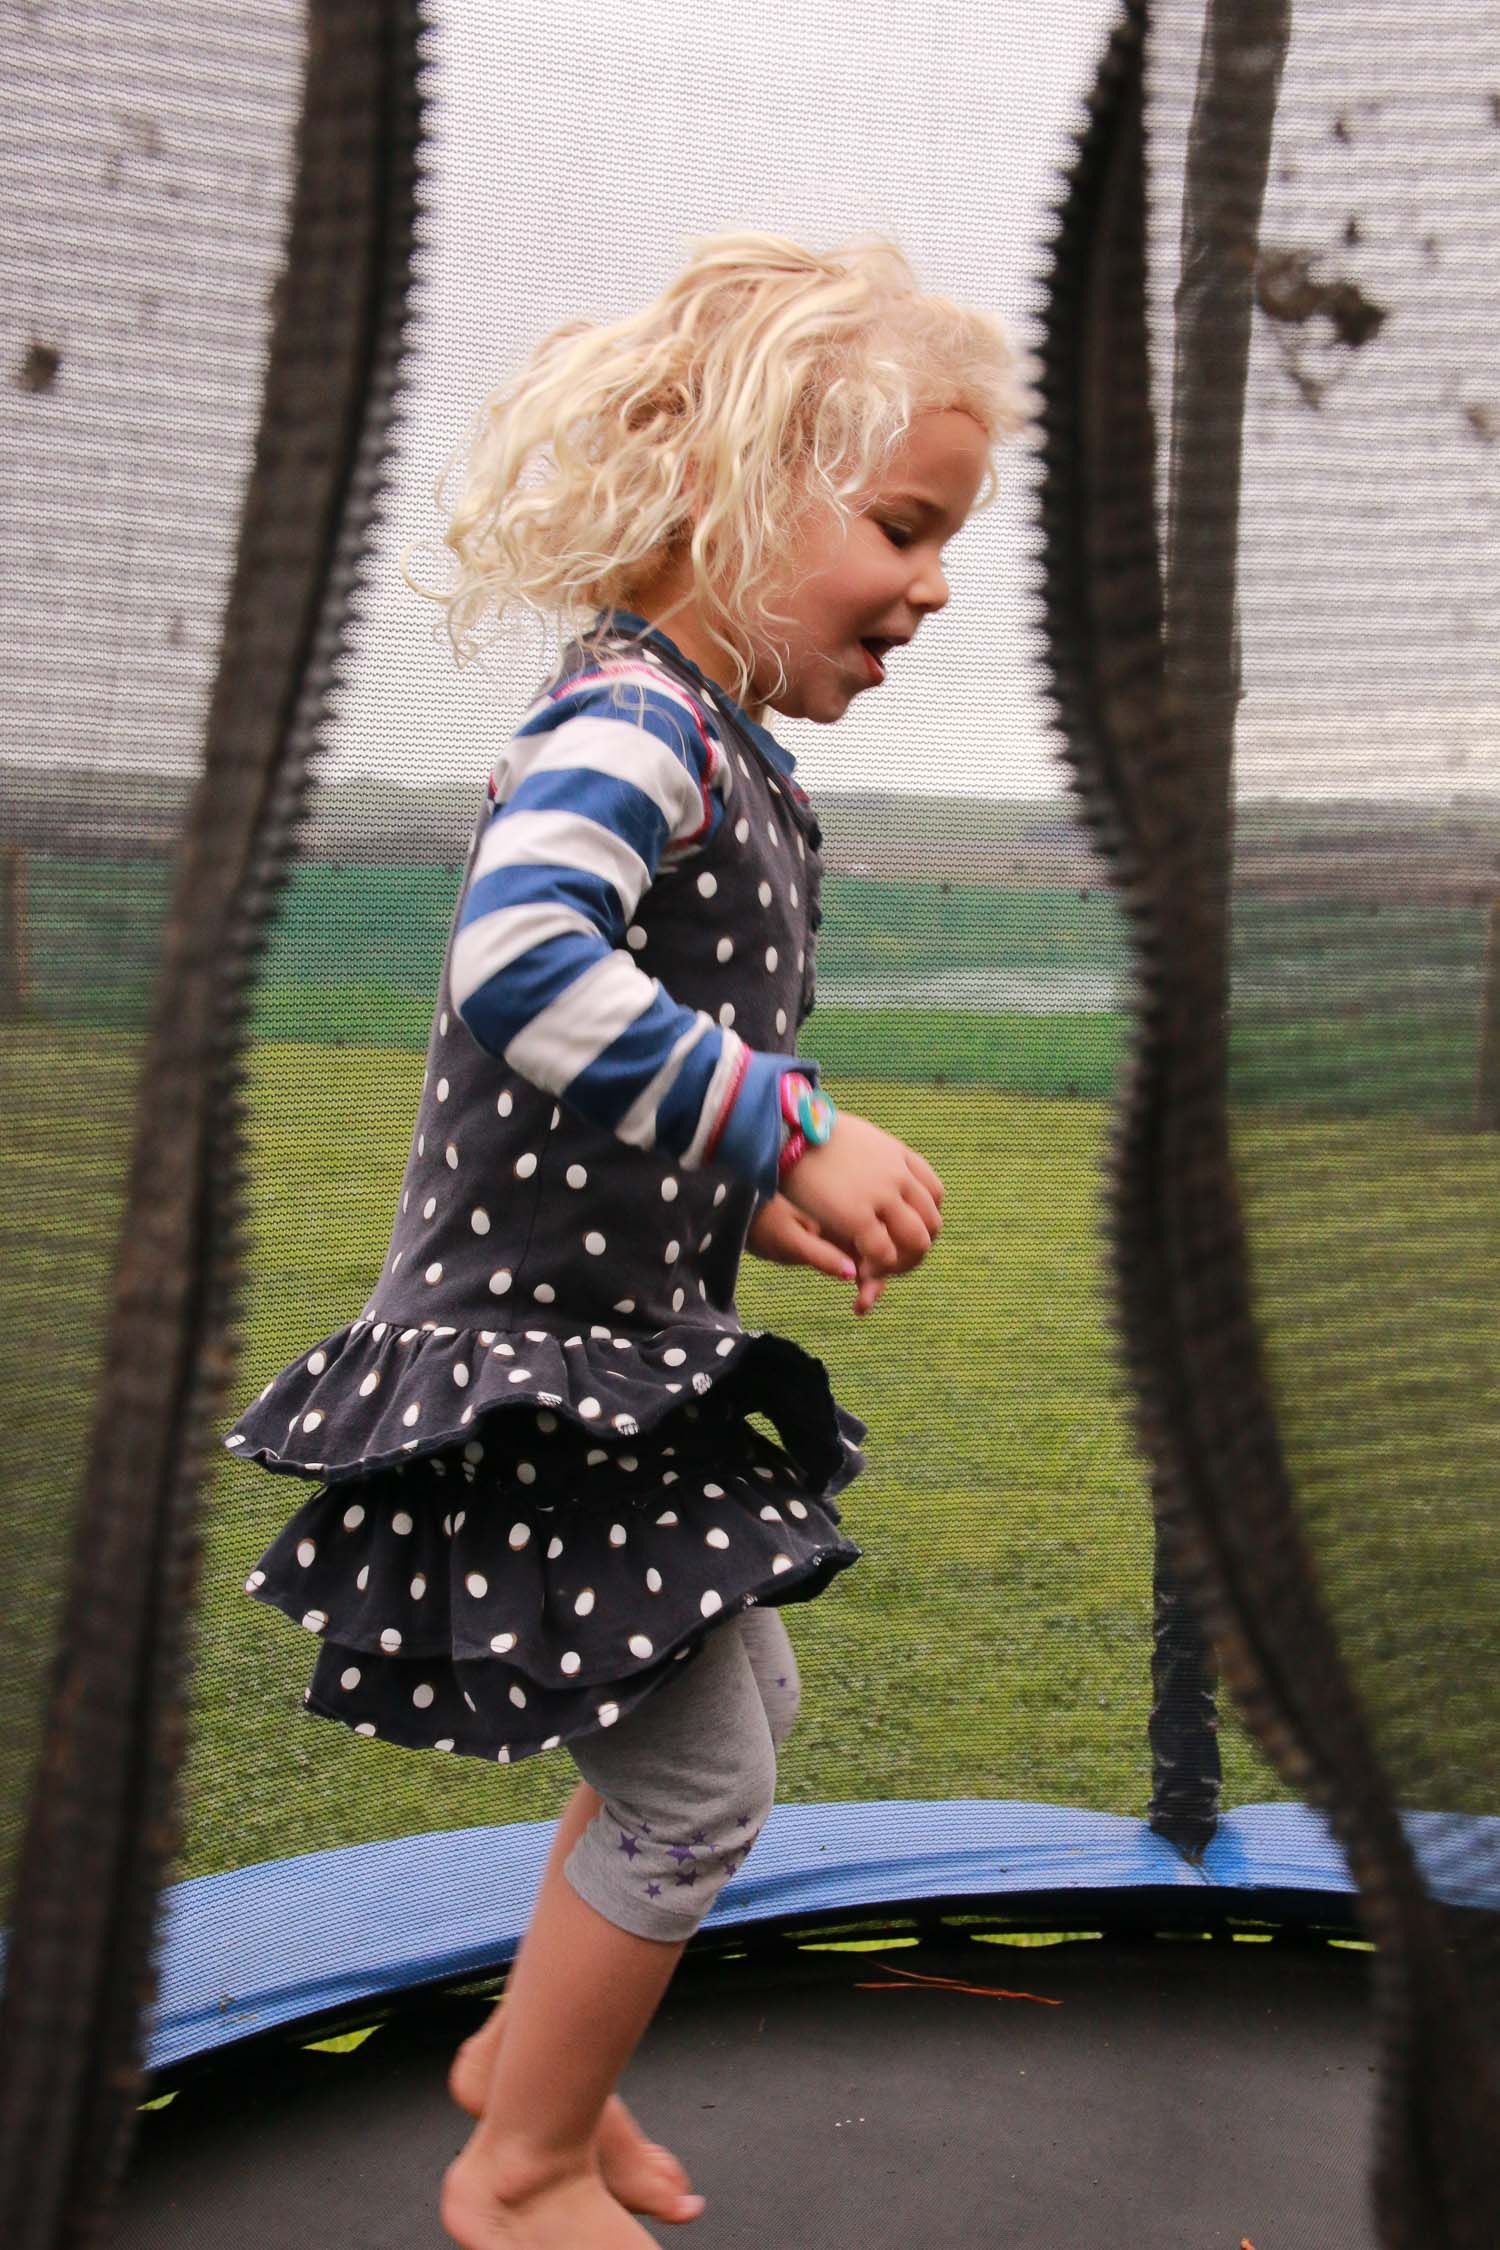 blonde-girl-jumping-on-trampoline-wearing-dress.jpg